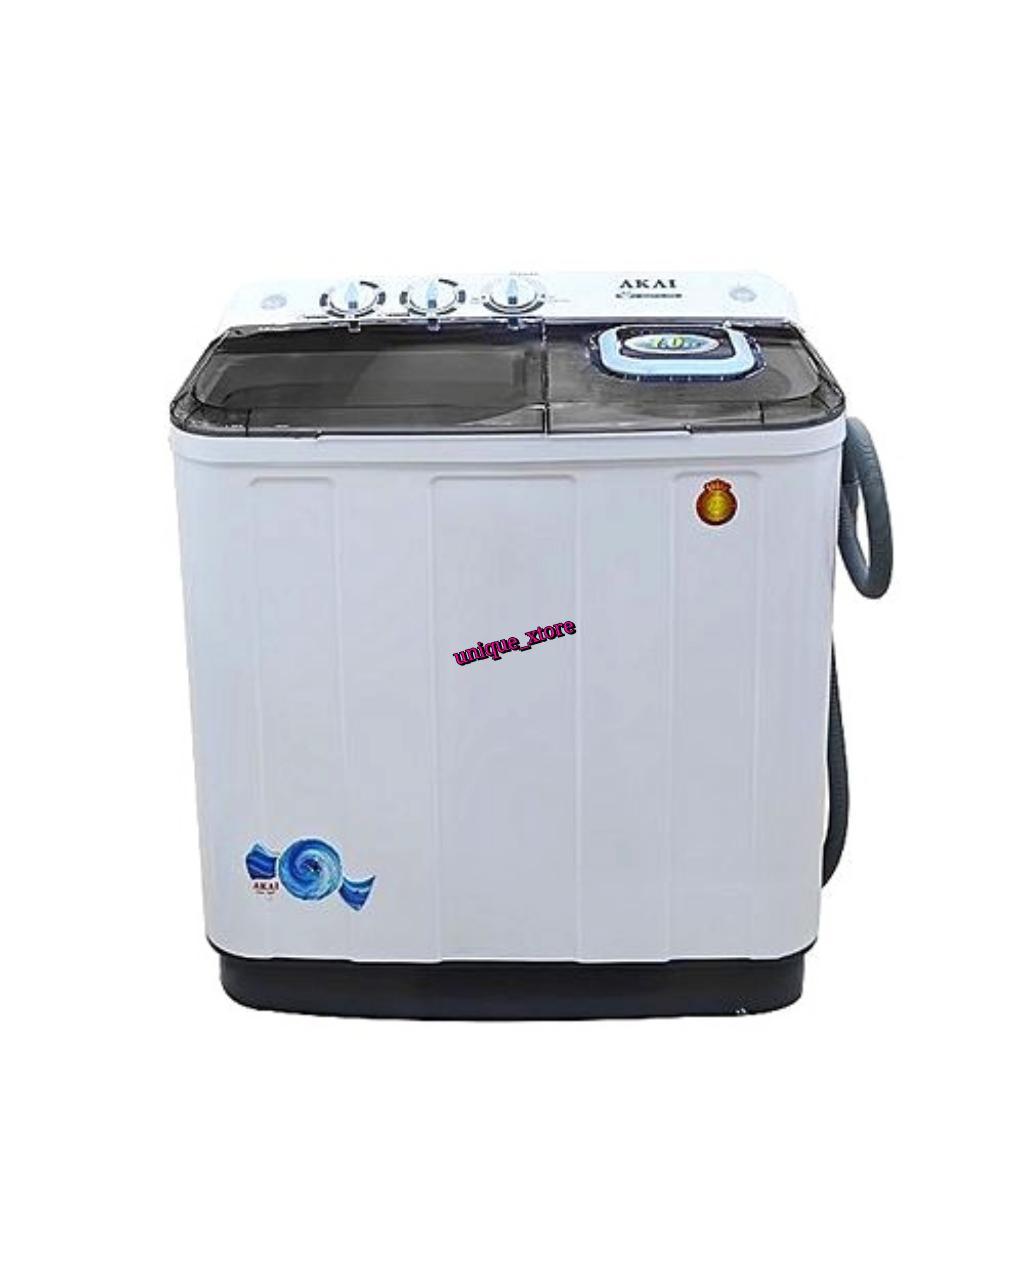 AKAI 7.0kg Twin Tub Washing Machine - SPINNING + DRAINING